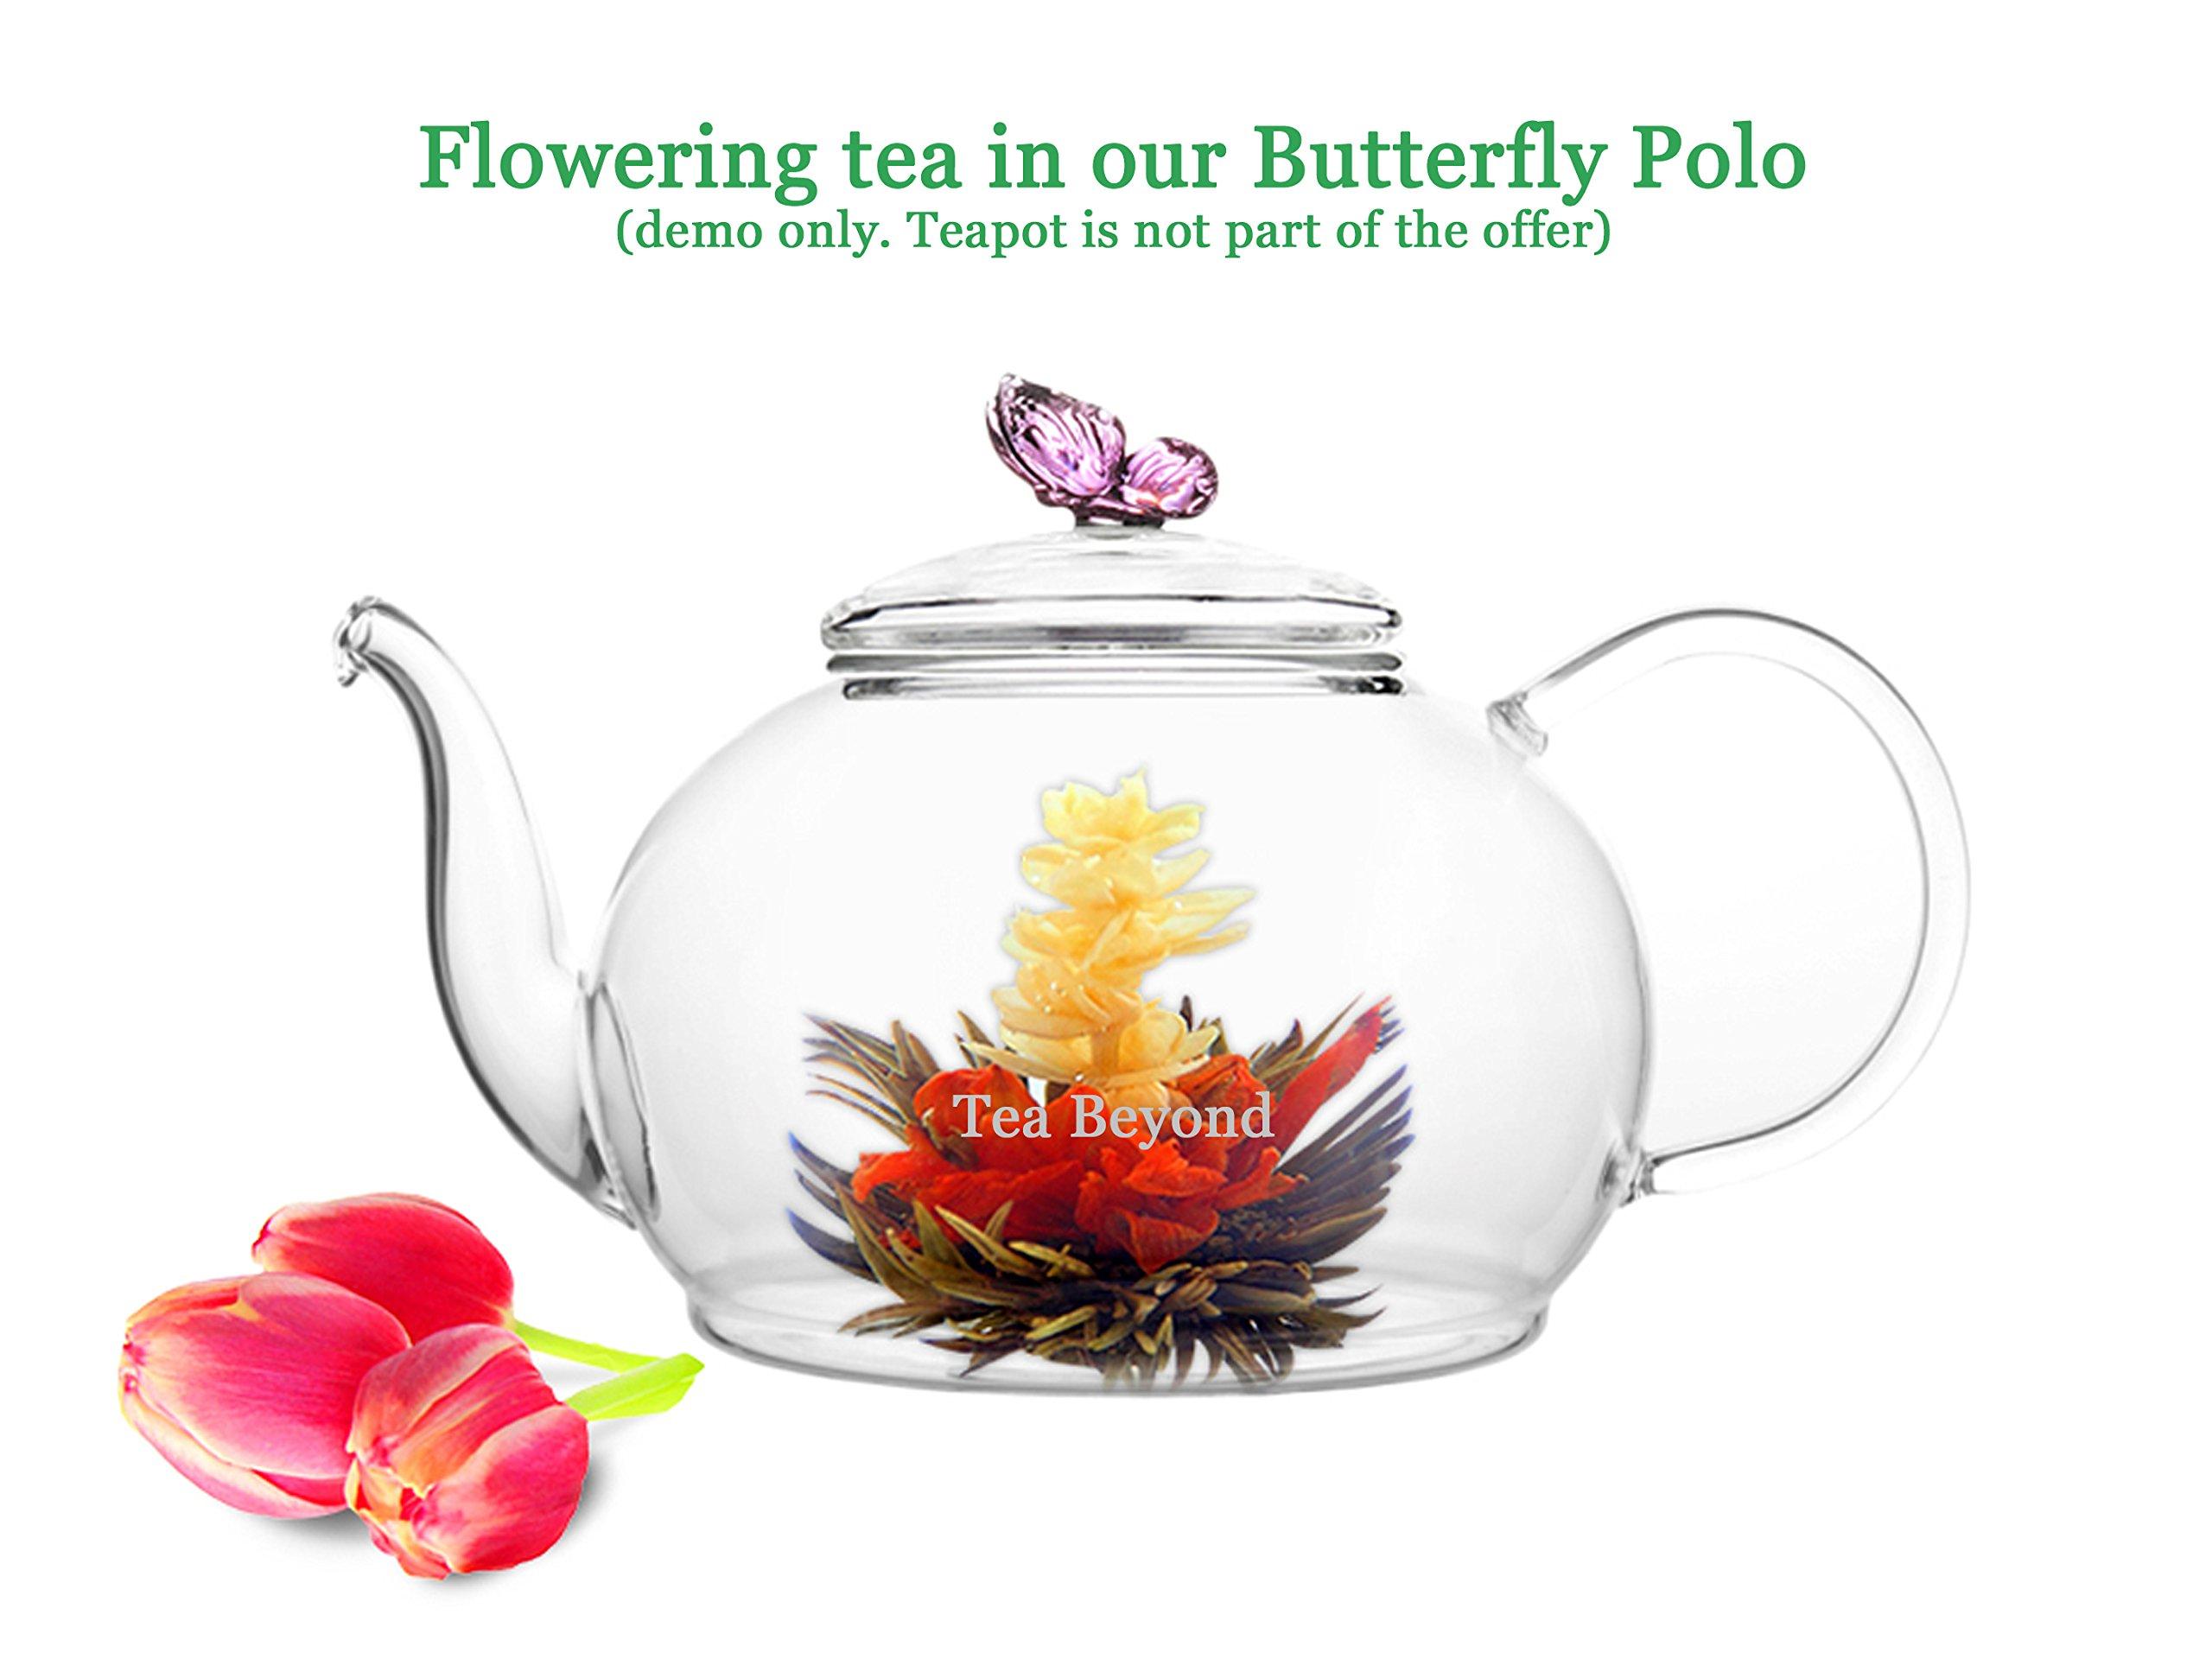 Tea Beyond Black Tea Gift set Iced Or Hot English Breakfast Flowering Tea 12 Packs Black Tea Blooming Tea Assorted Black Tea NON GMO Vegan Friendly 100% Natural No Artificial or Natural Flavors added